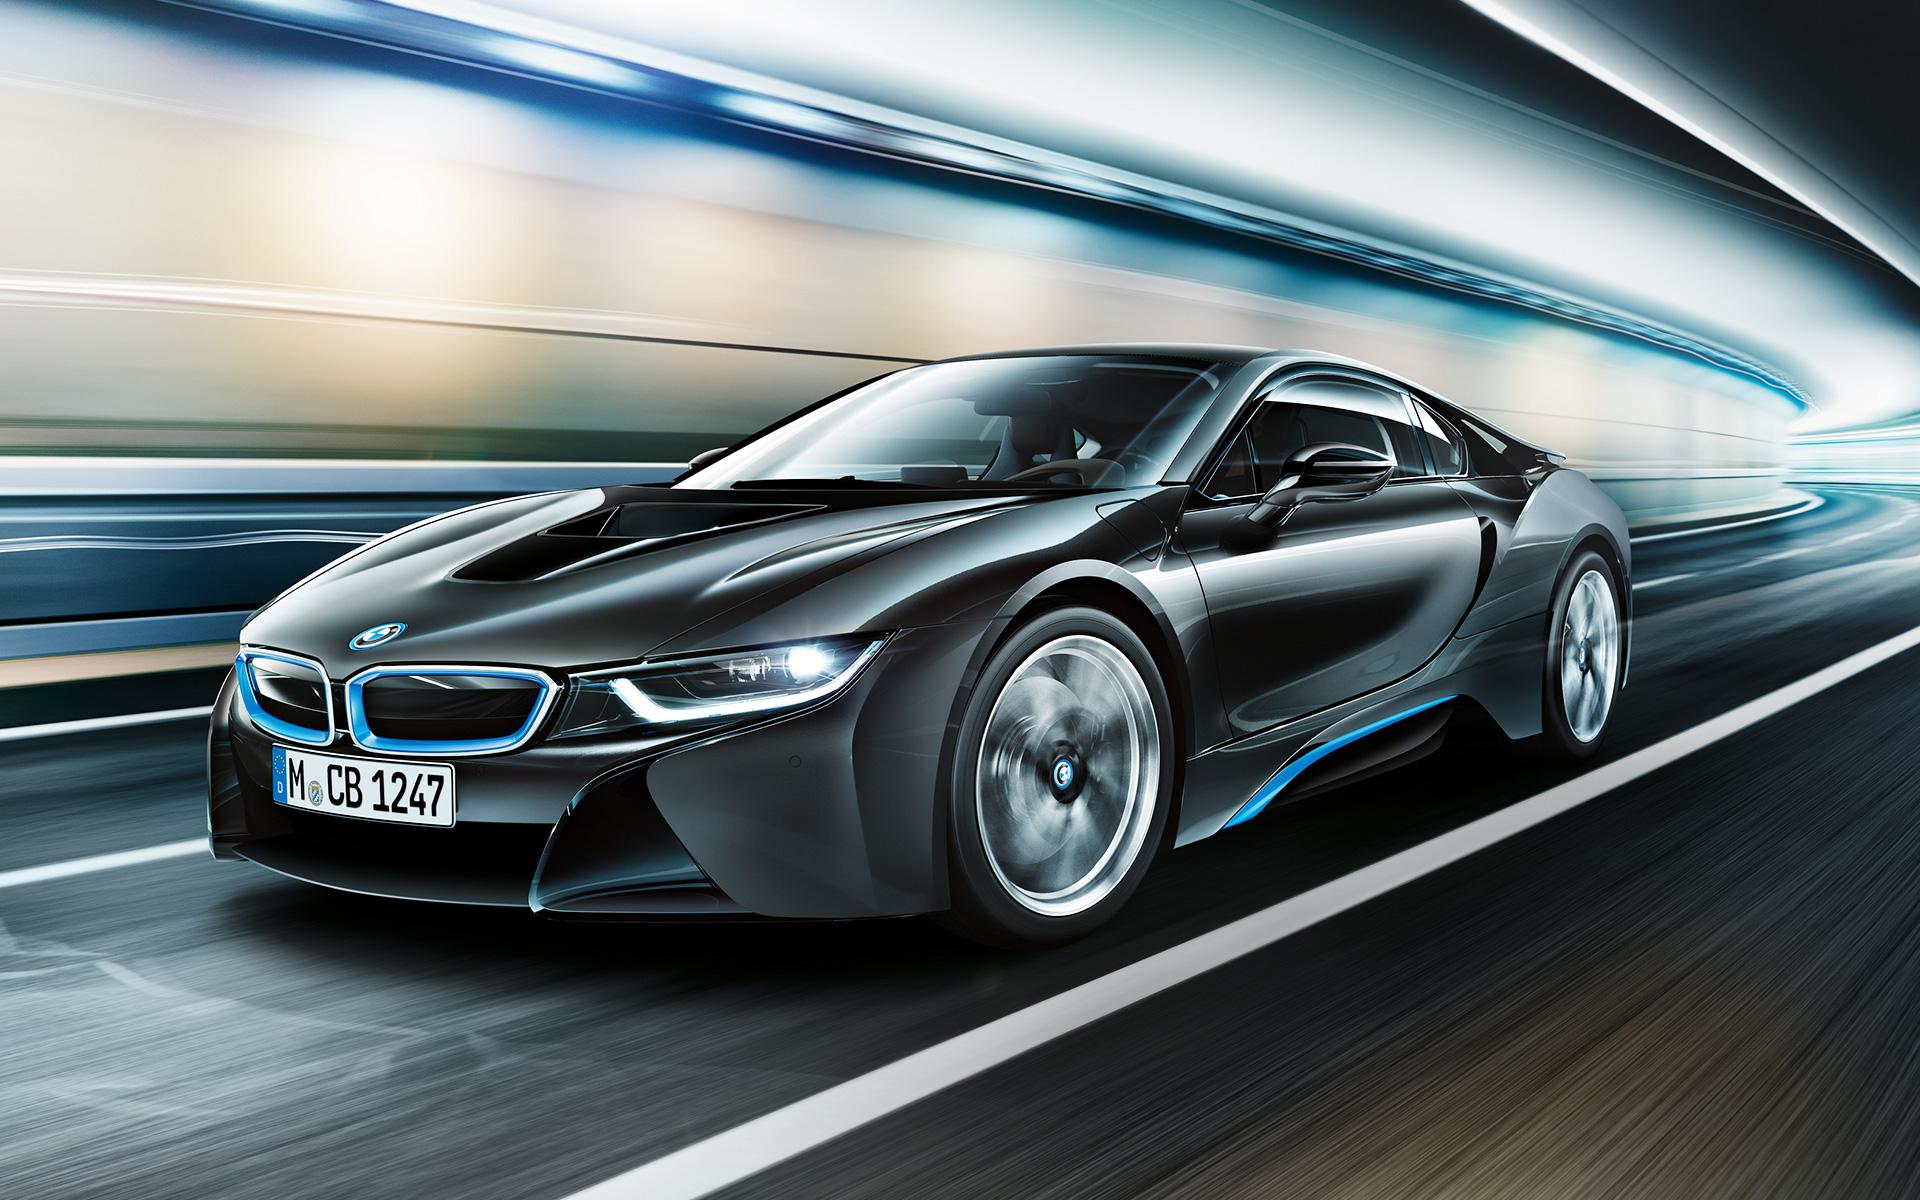 BMW i8 Protonic Frozen Black wallpaper04